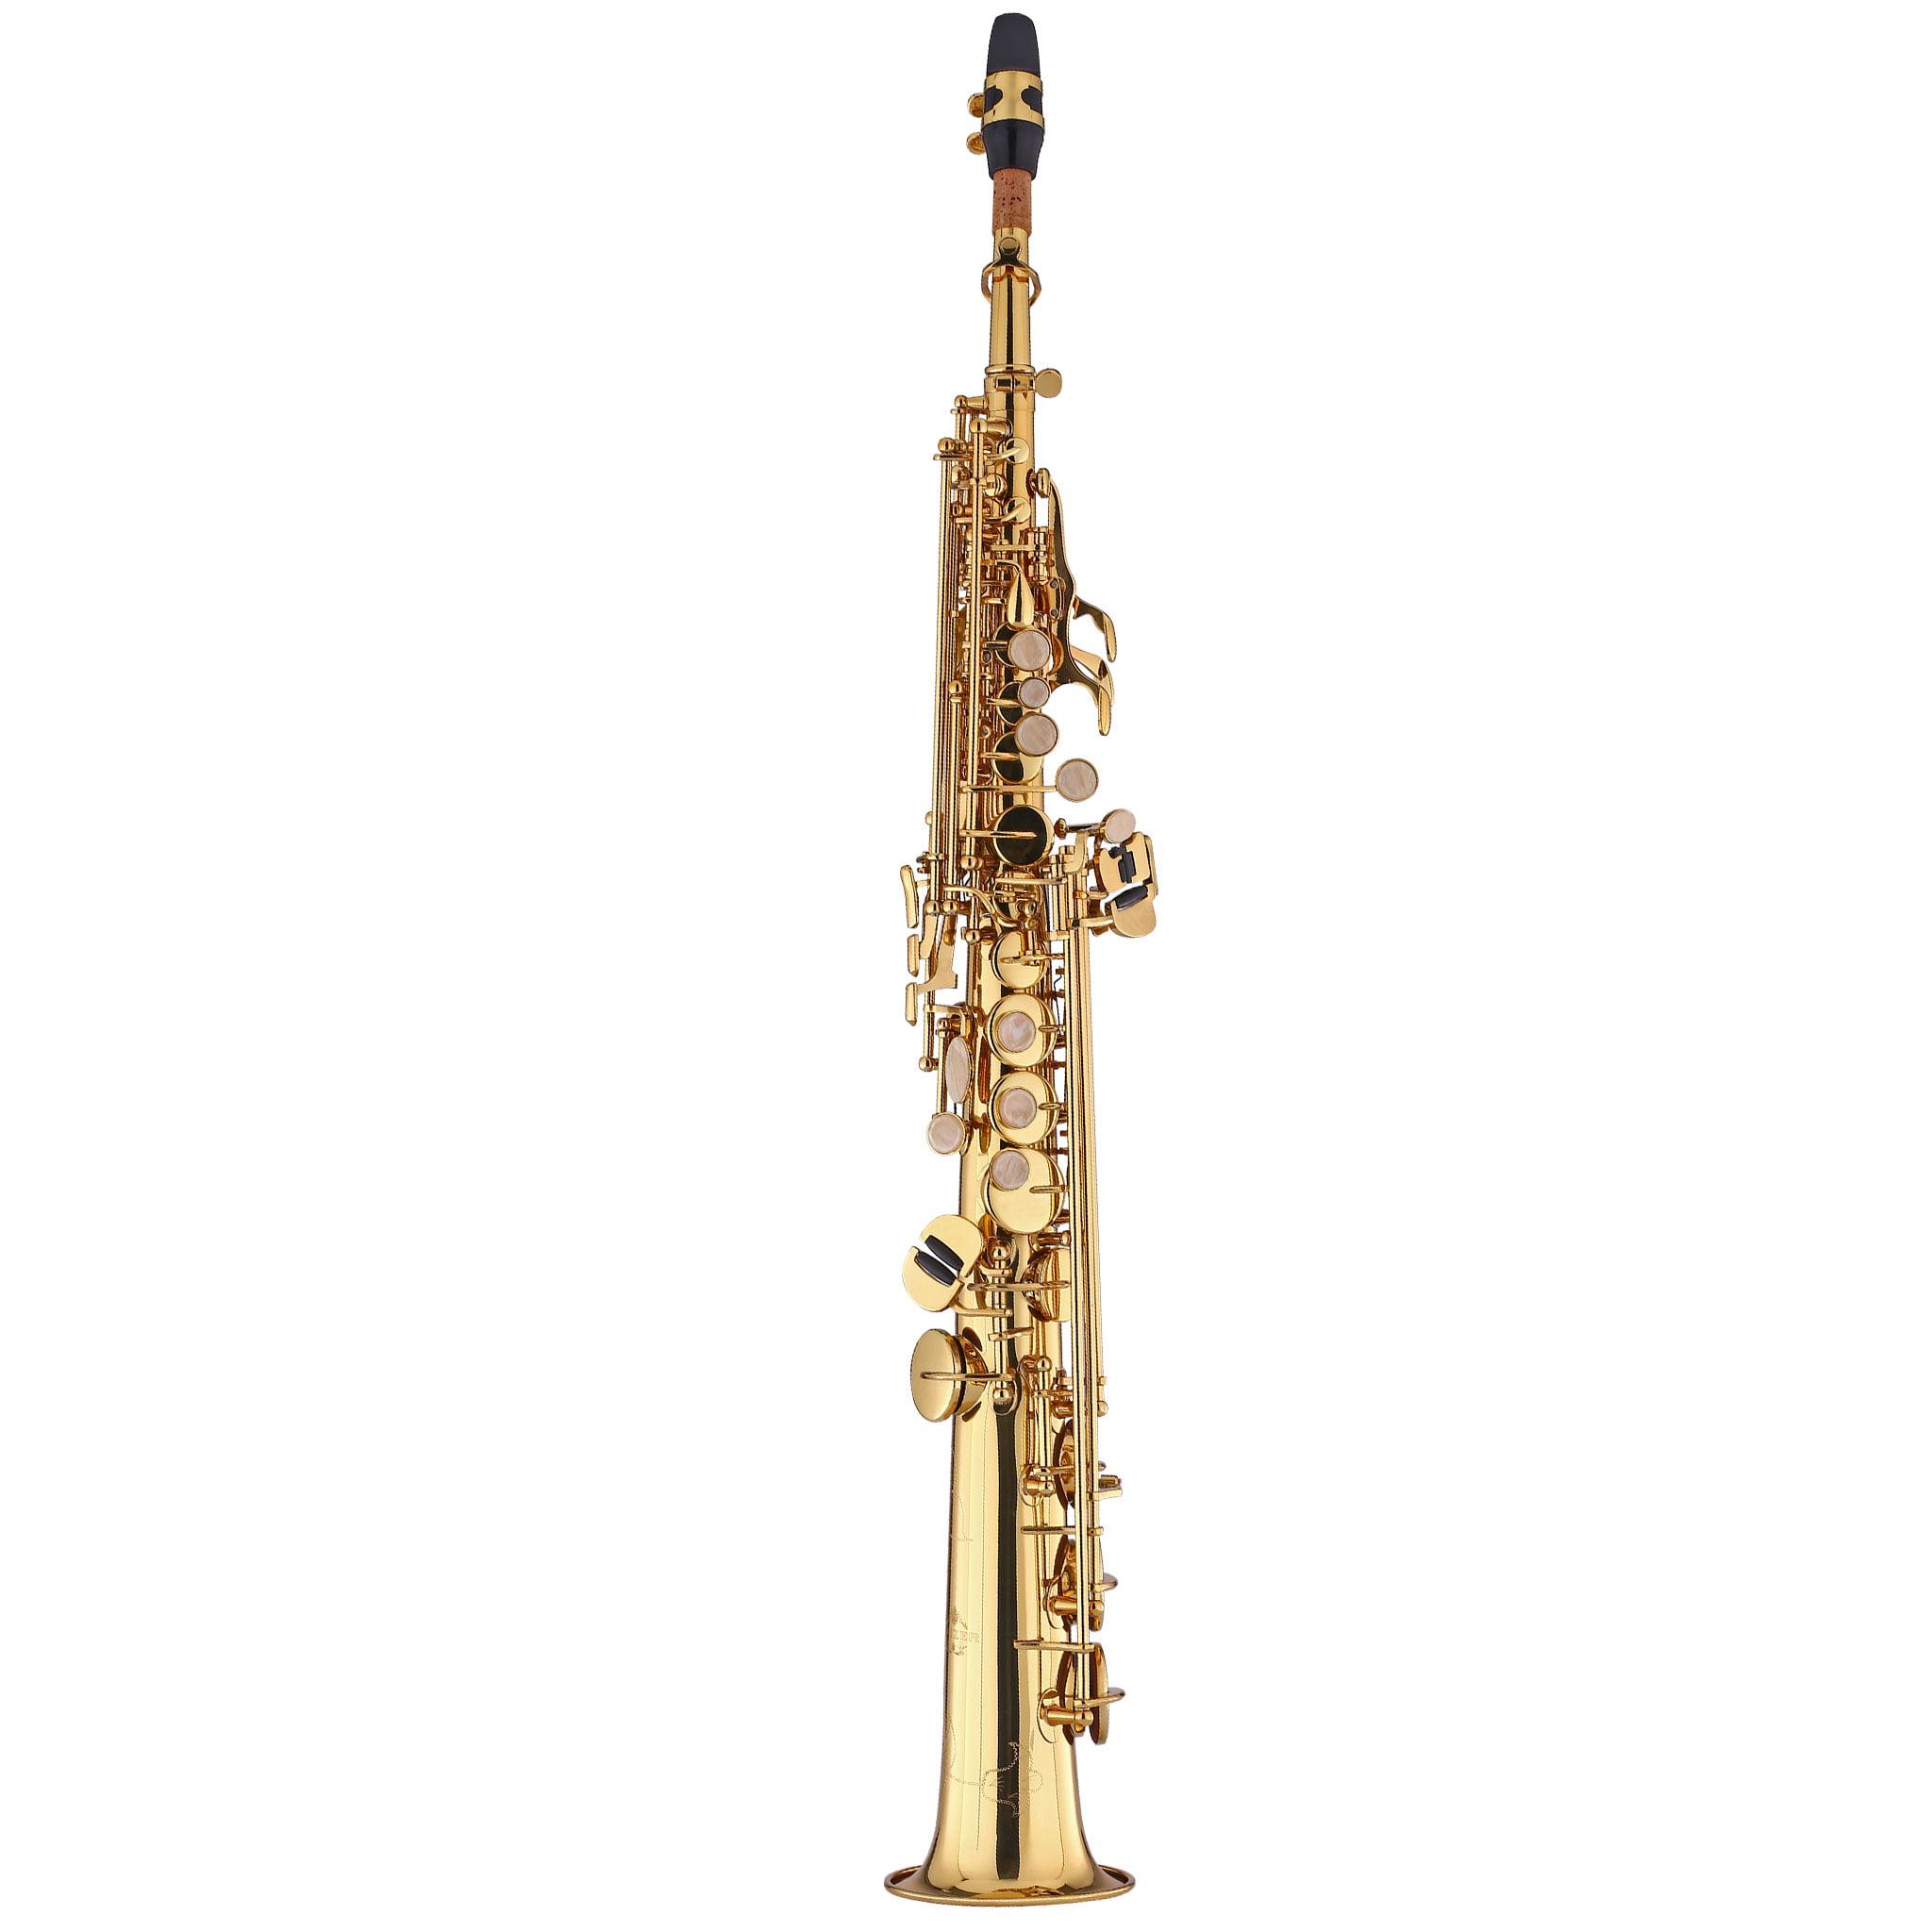 Kaizer Soprano Saxophone Straight B Flat Bb Gold Lacquer SSAX-1000LQ by Kaizer